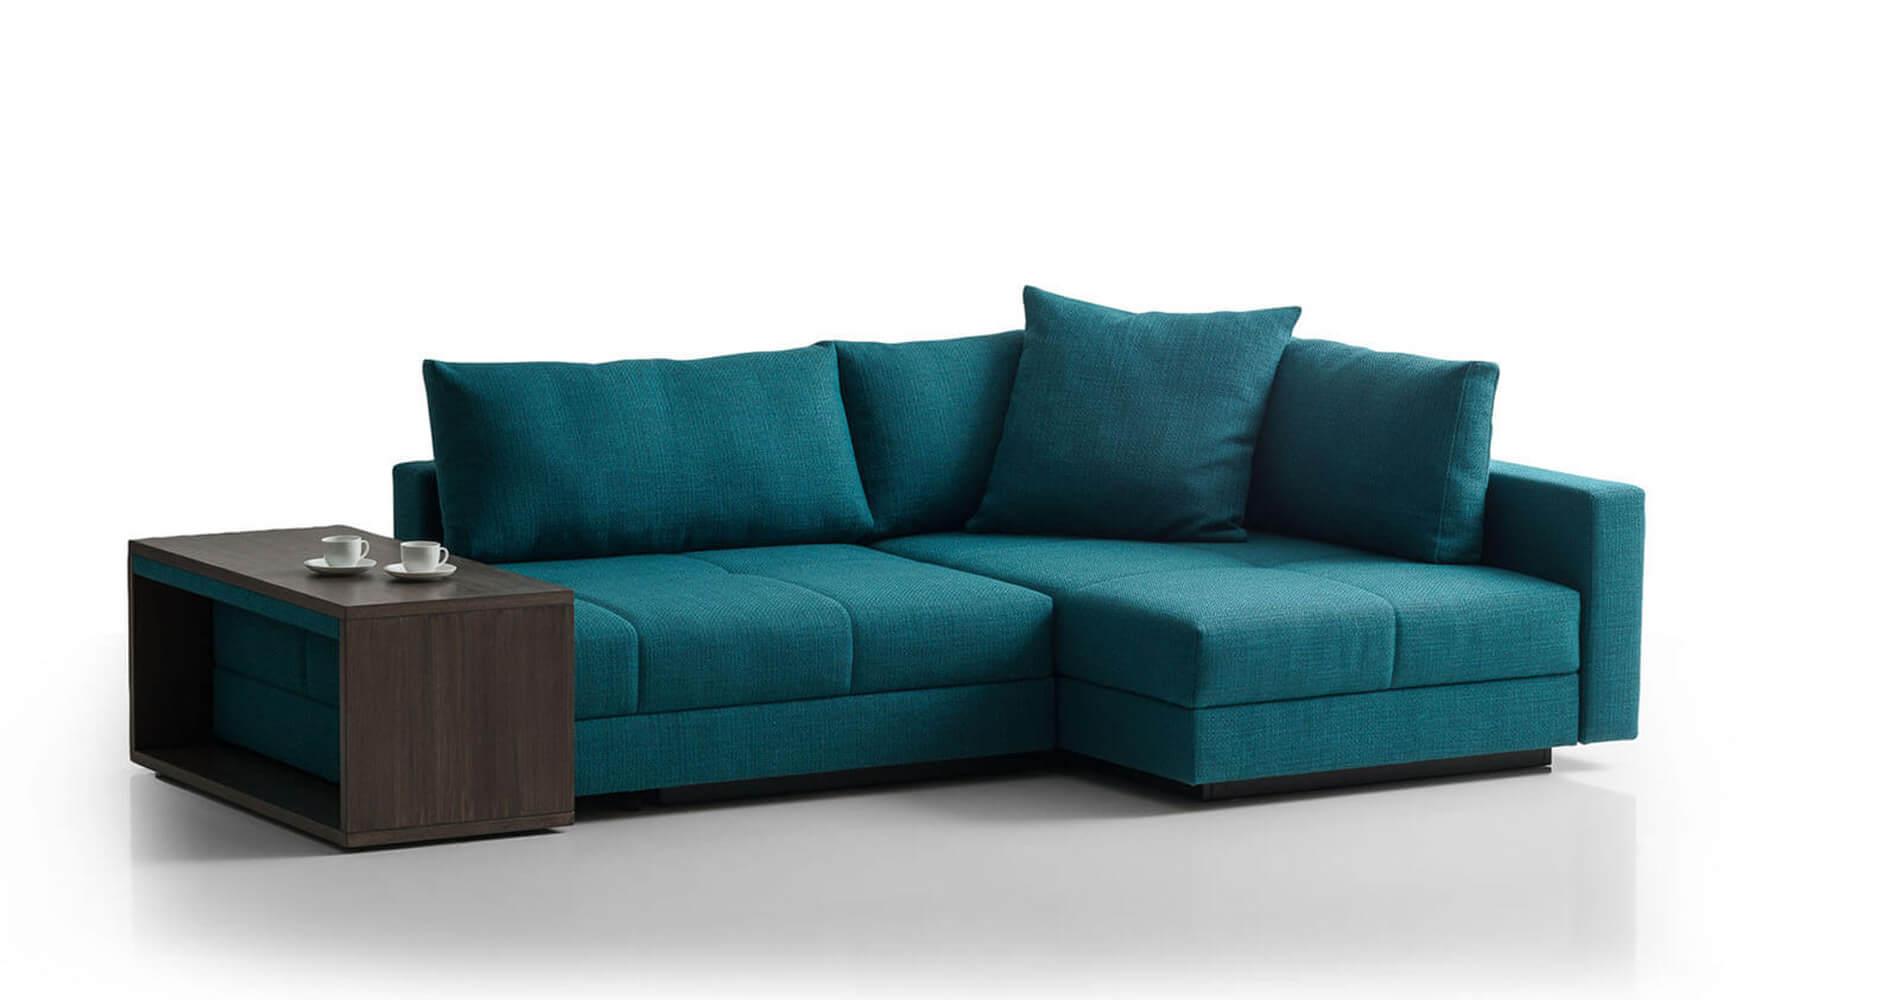 franz fertig schlafsofa club schlafsofa von franz fertig sofabed schlafsofa von franz fertig. Black Bedroom Furniture Sets. Home Design Ideas